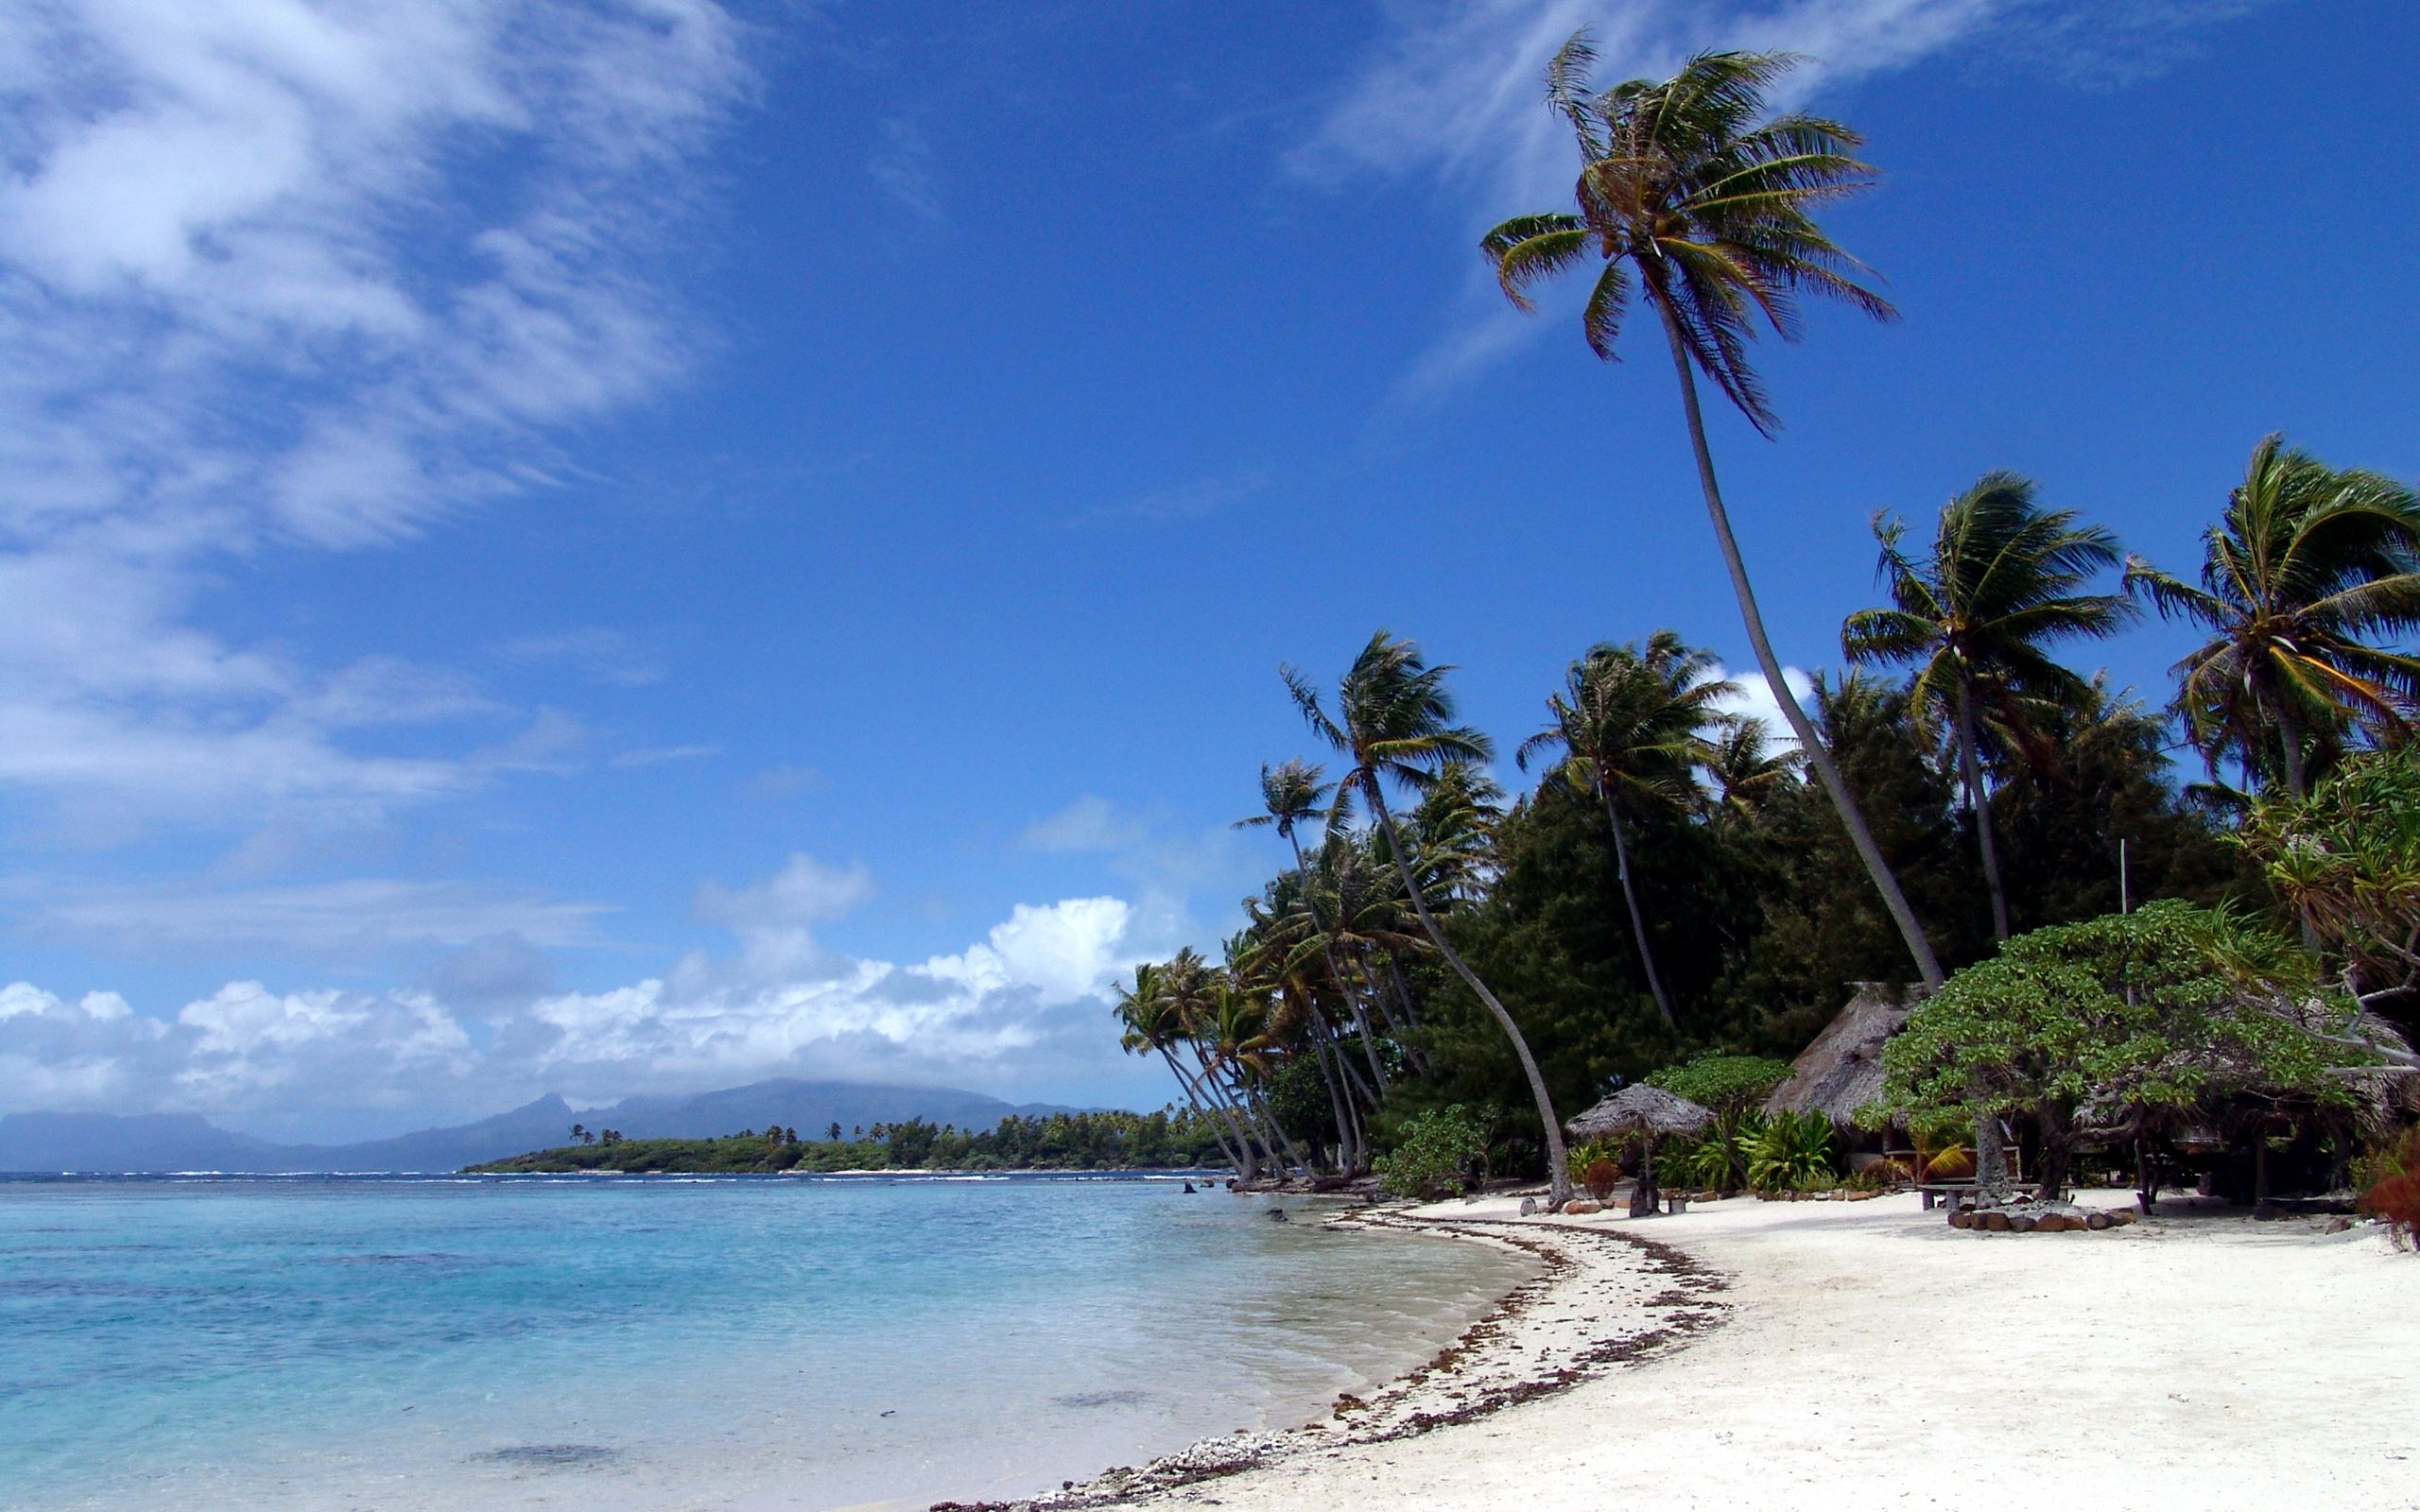 2560x1600 Polynesian beach desktop PC and Mac wallpaper 2560x1600